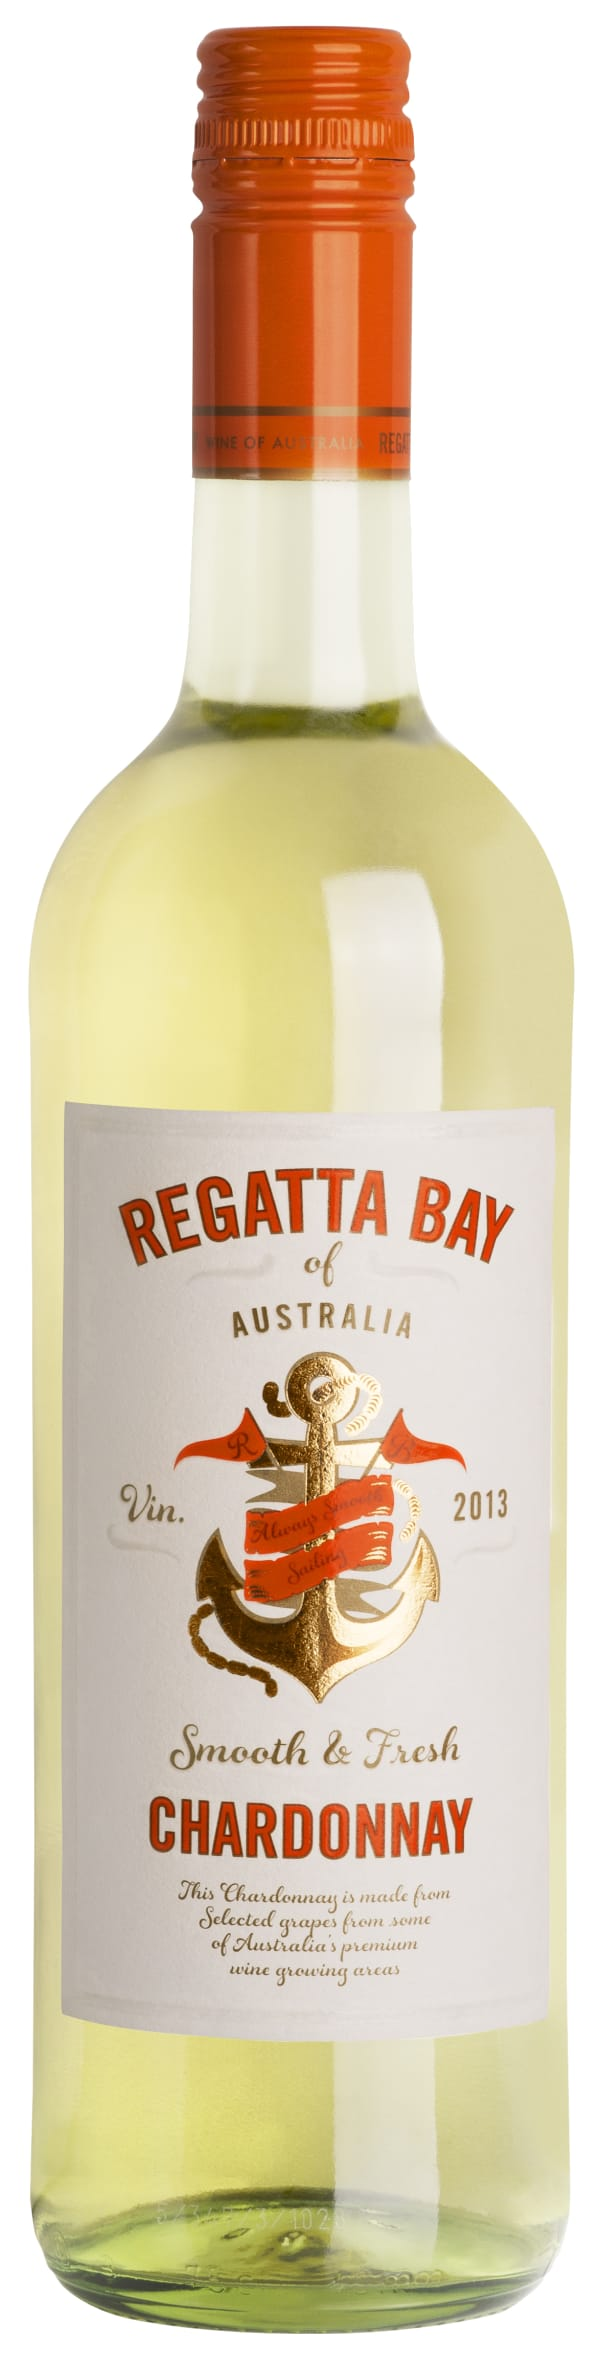 Regatta Bay Chardonnay  2015